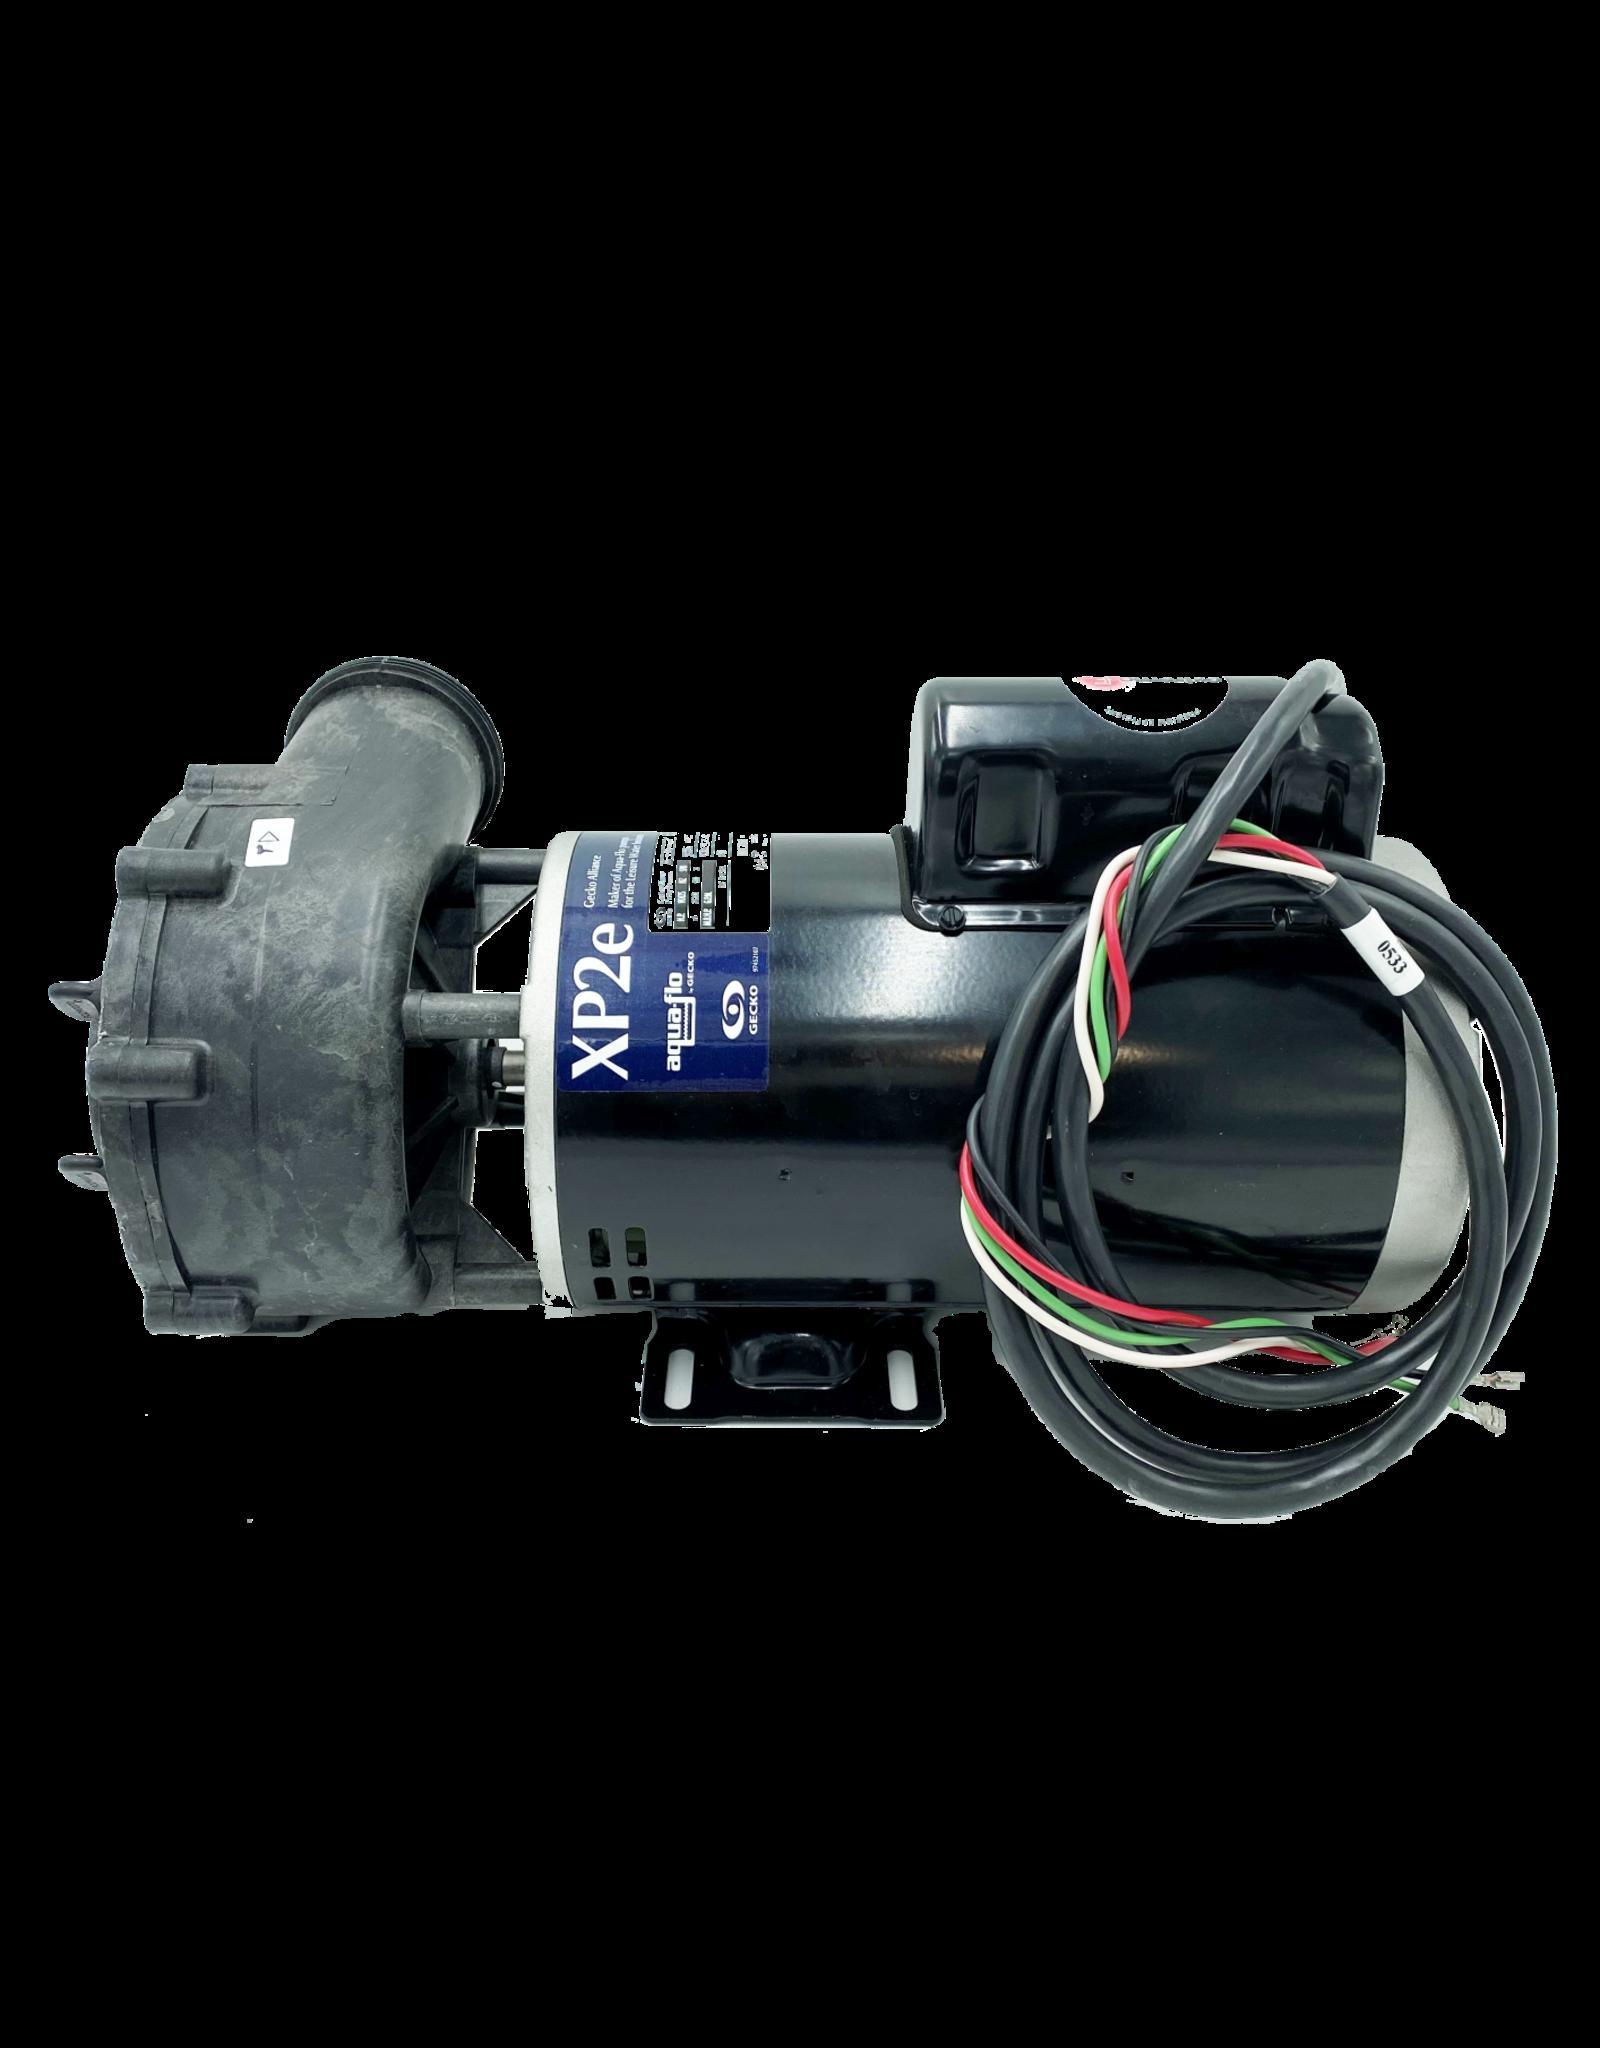 Blue Falls Manufacturing Pump 3HP Aquaflo 2 spd 05334019-5000 (replaces Waterway 4hp)